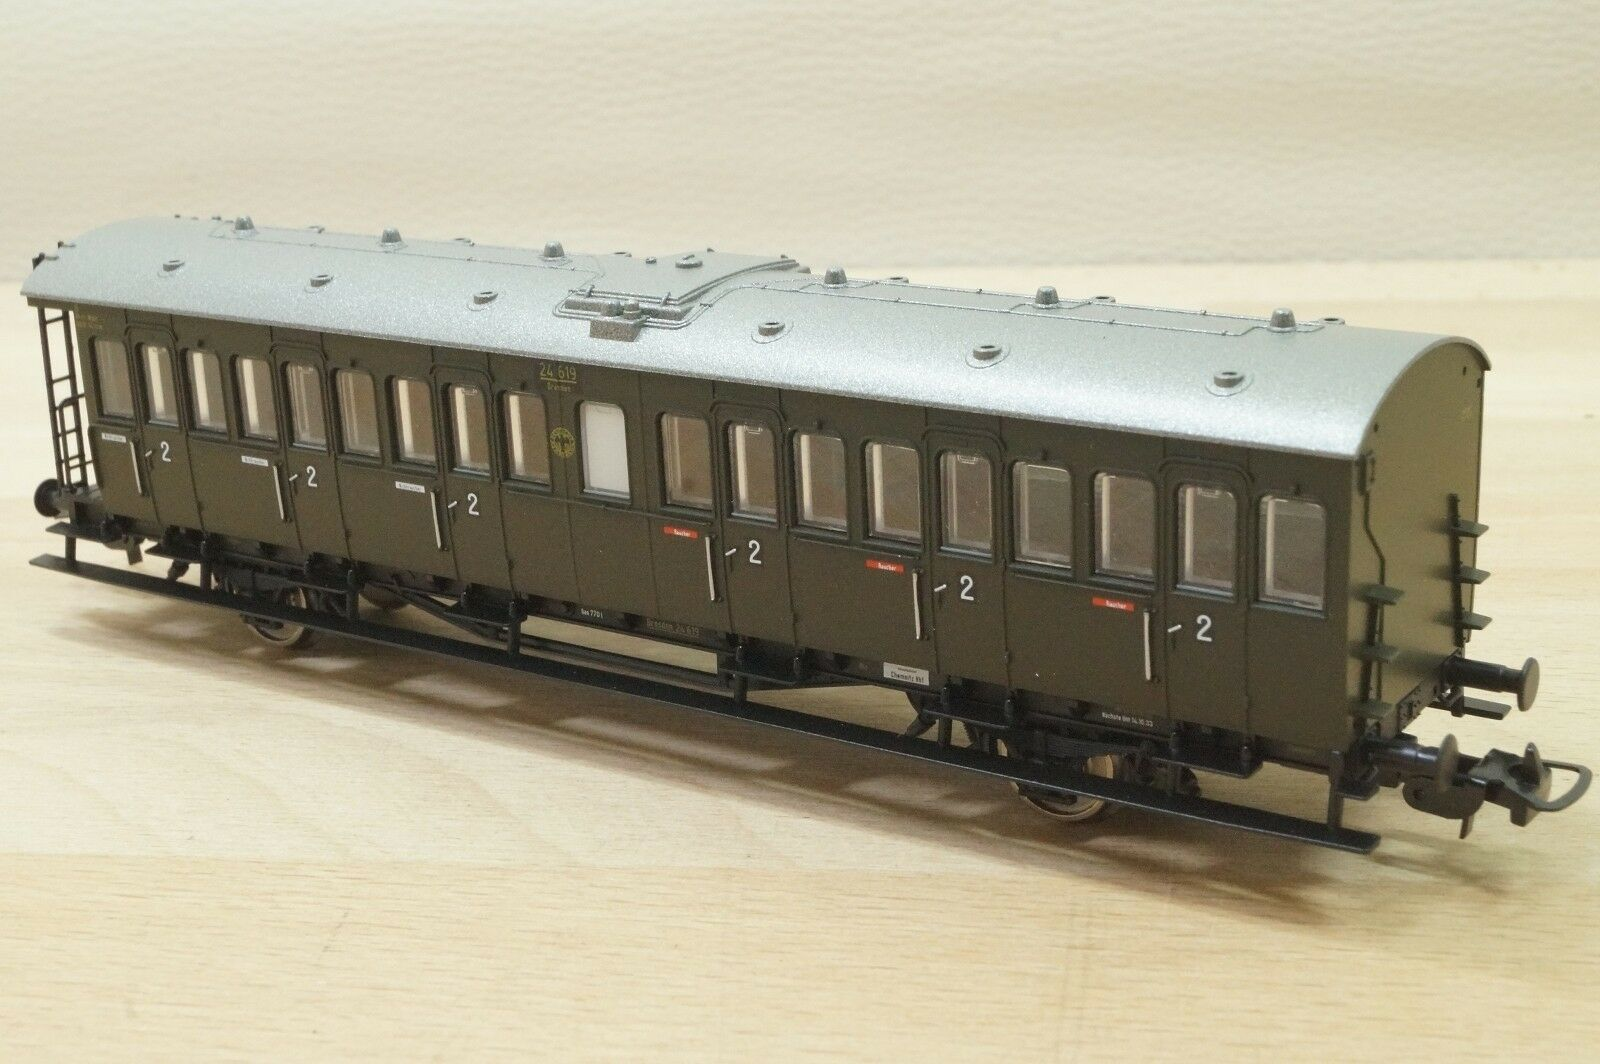 Piko 53140  Personenwagen 2. 2. 2. Klasse BSa13  N° 24 619 der DRG Sachsenwagen,  Neu d47503